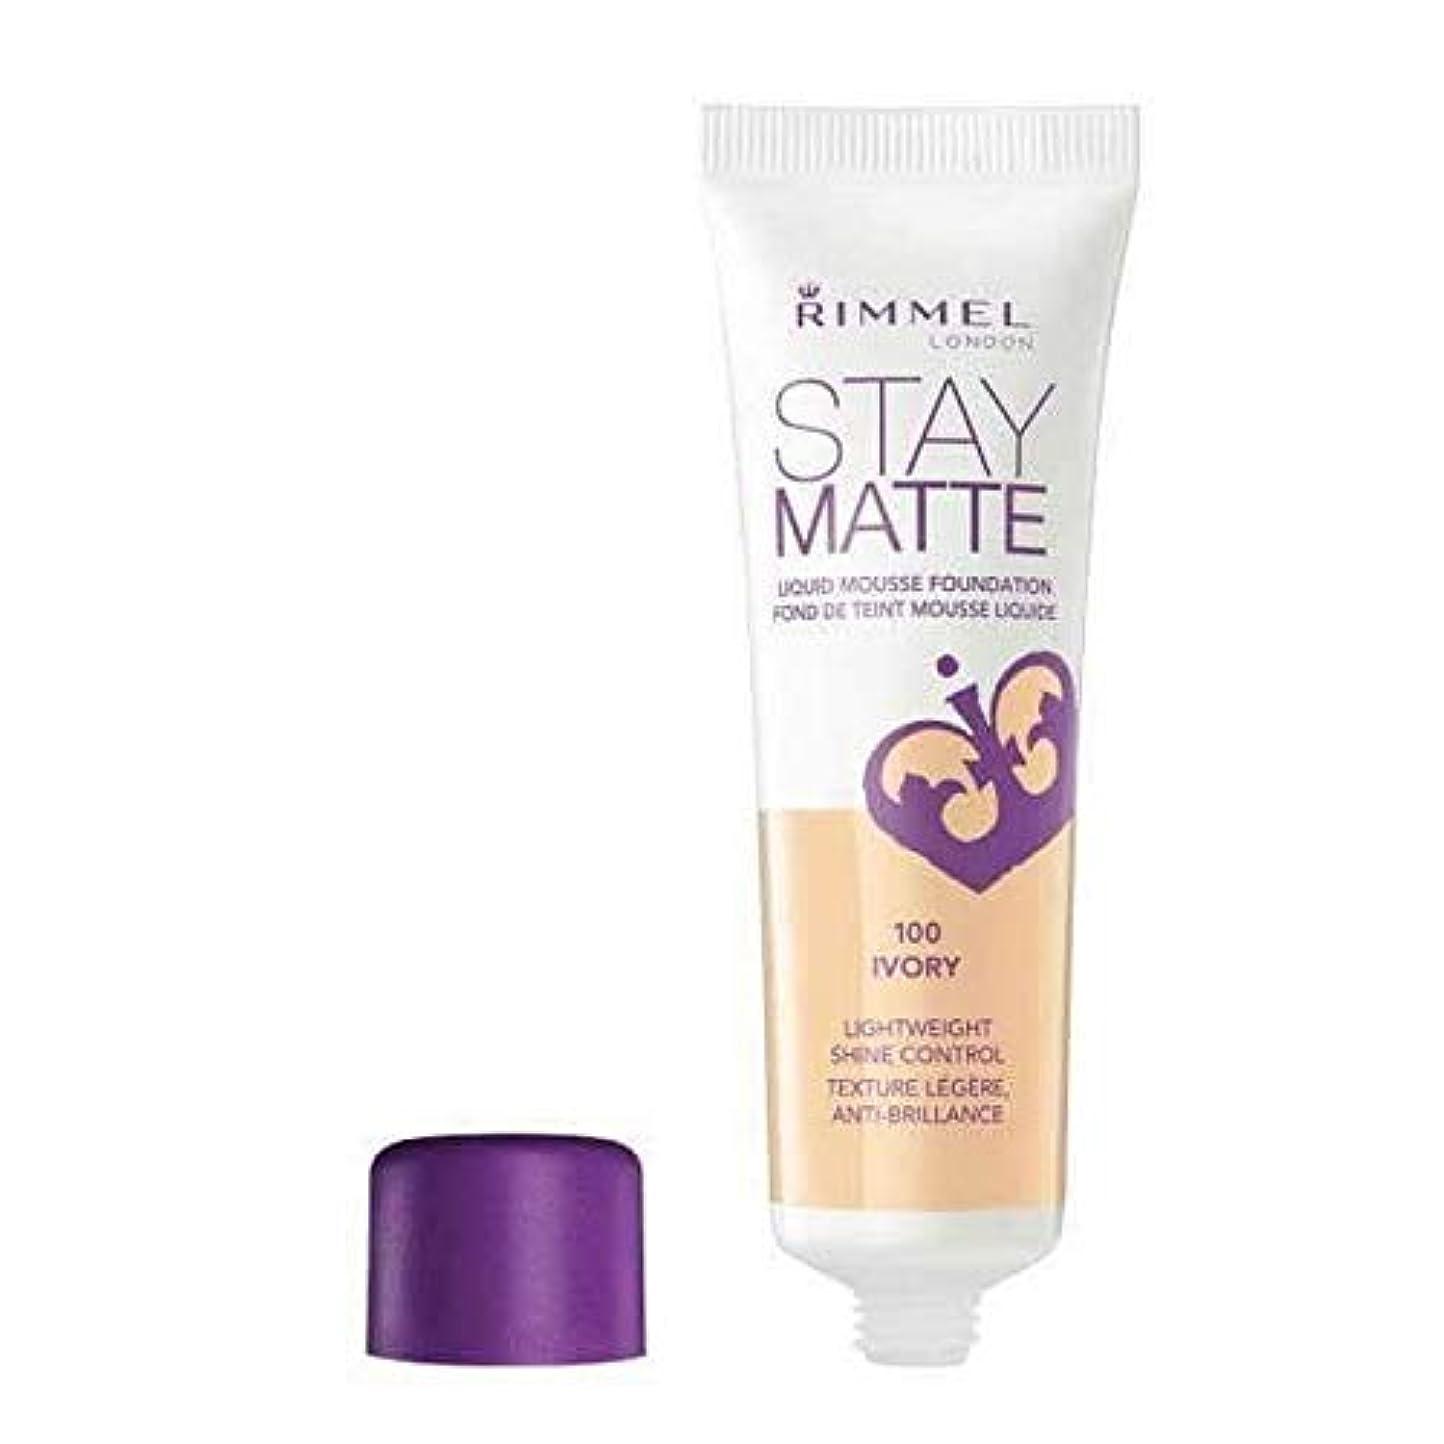 [Rimmel ] リンメルステイマット基礎アイボリー - Rimmel Stay Matte Foundation Ivory [並行輸入品]